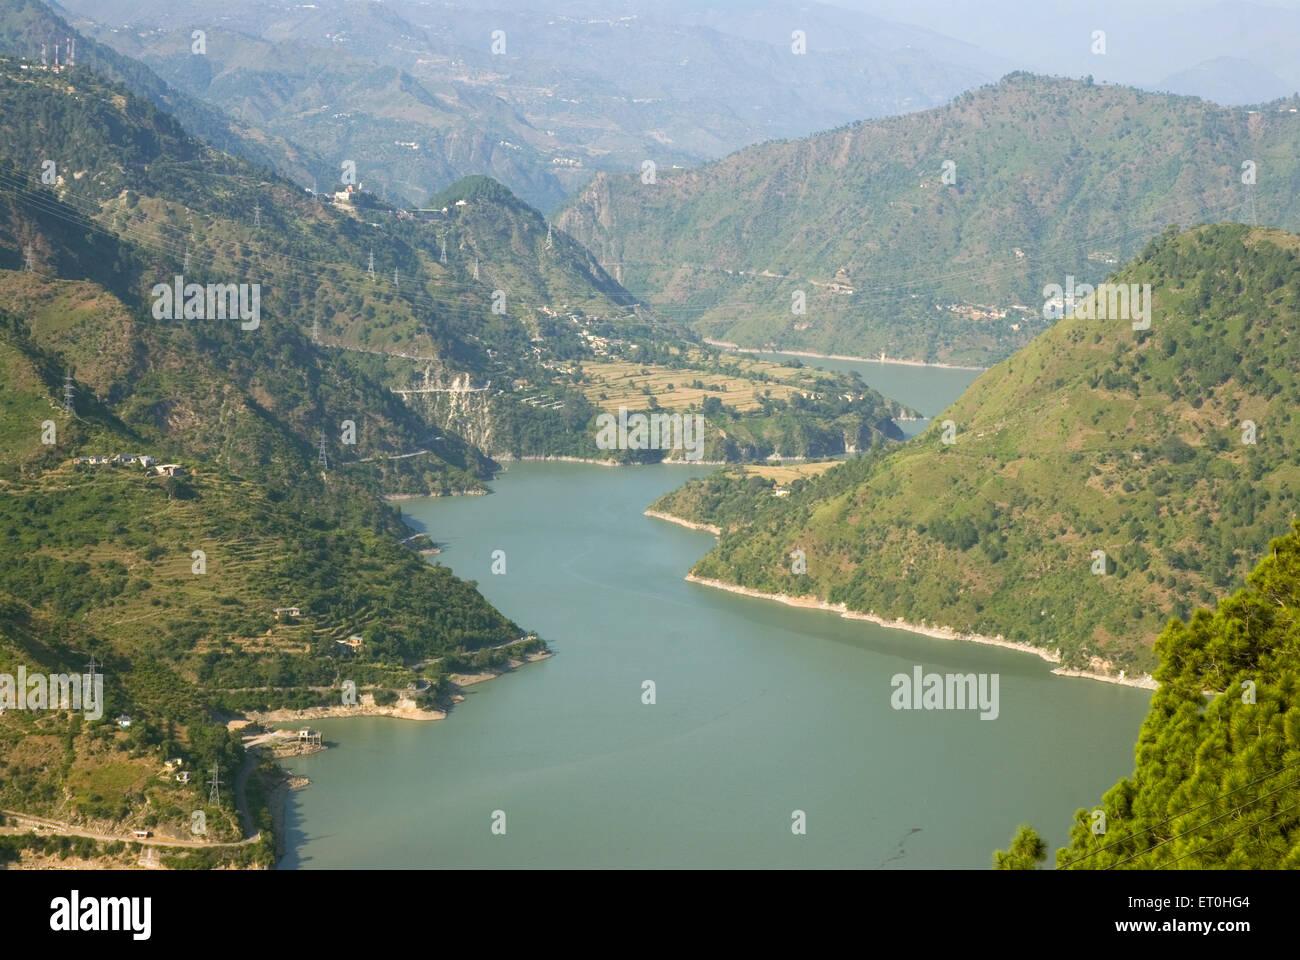 Mountain range with beas river ; Himachal Pradesh ; India - Stock Image